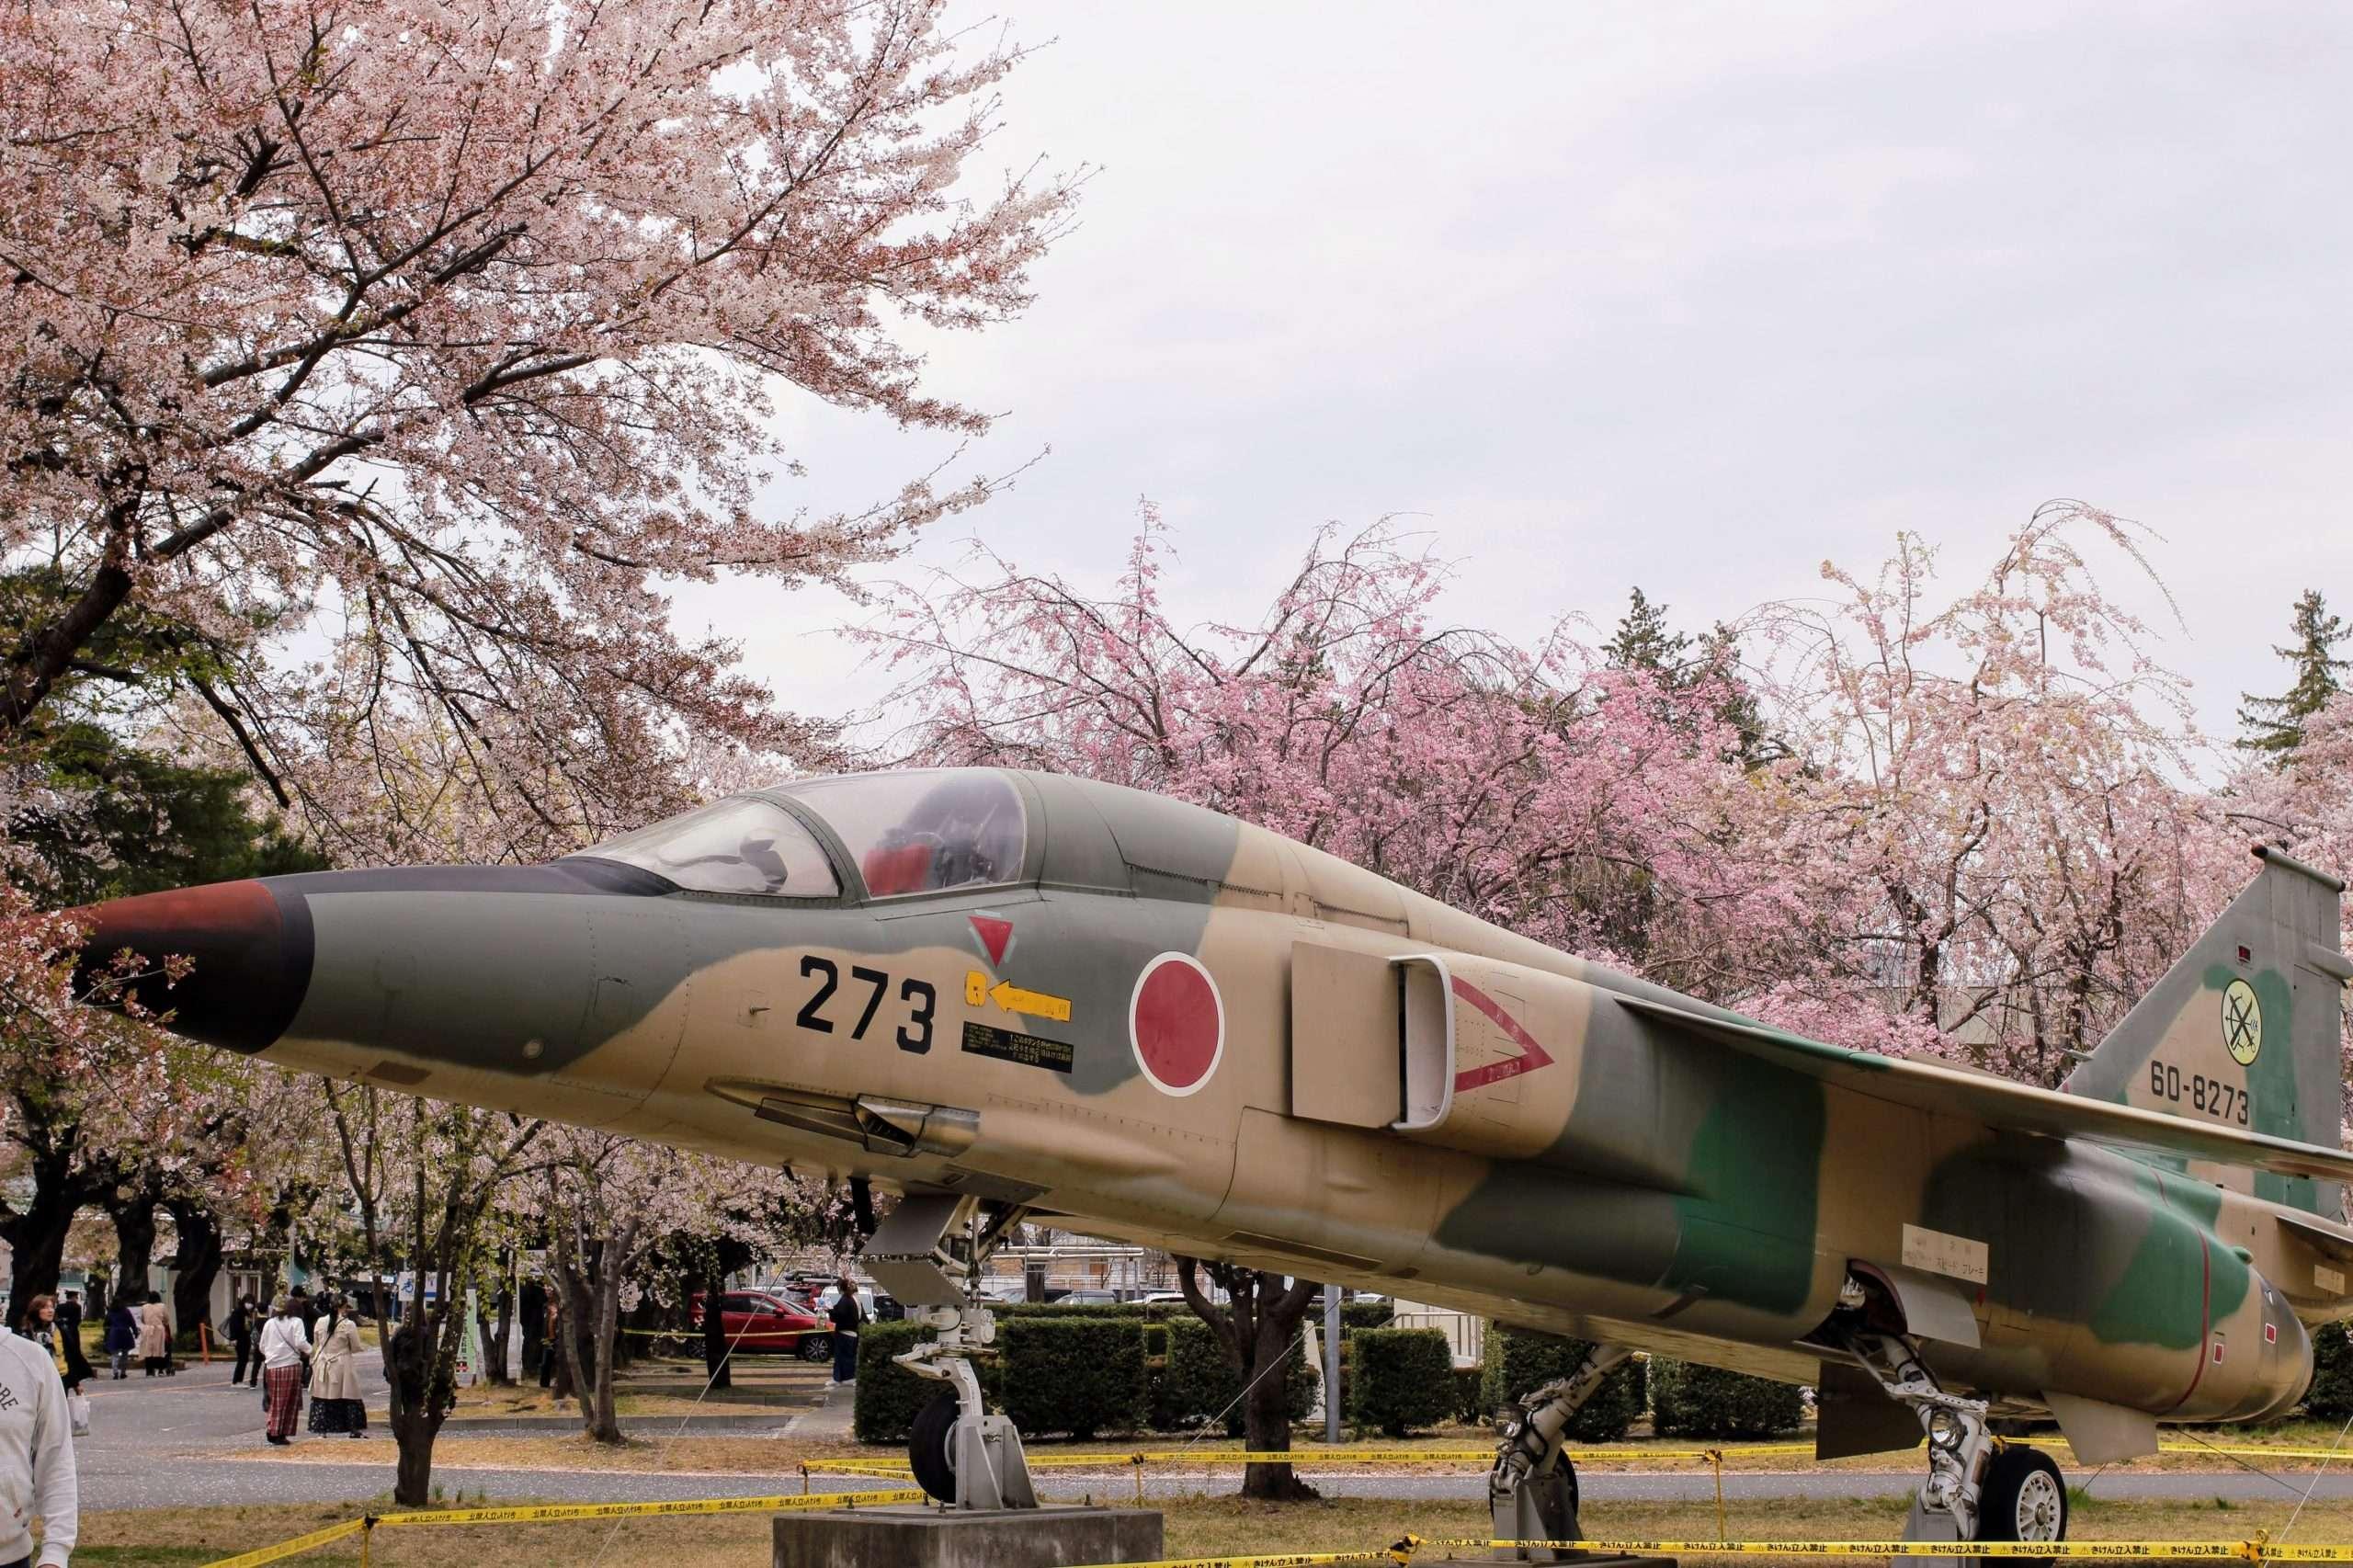 An air base cherry blossom festival in Saitama Prefecture, more info on insaitama.com